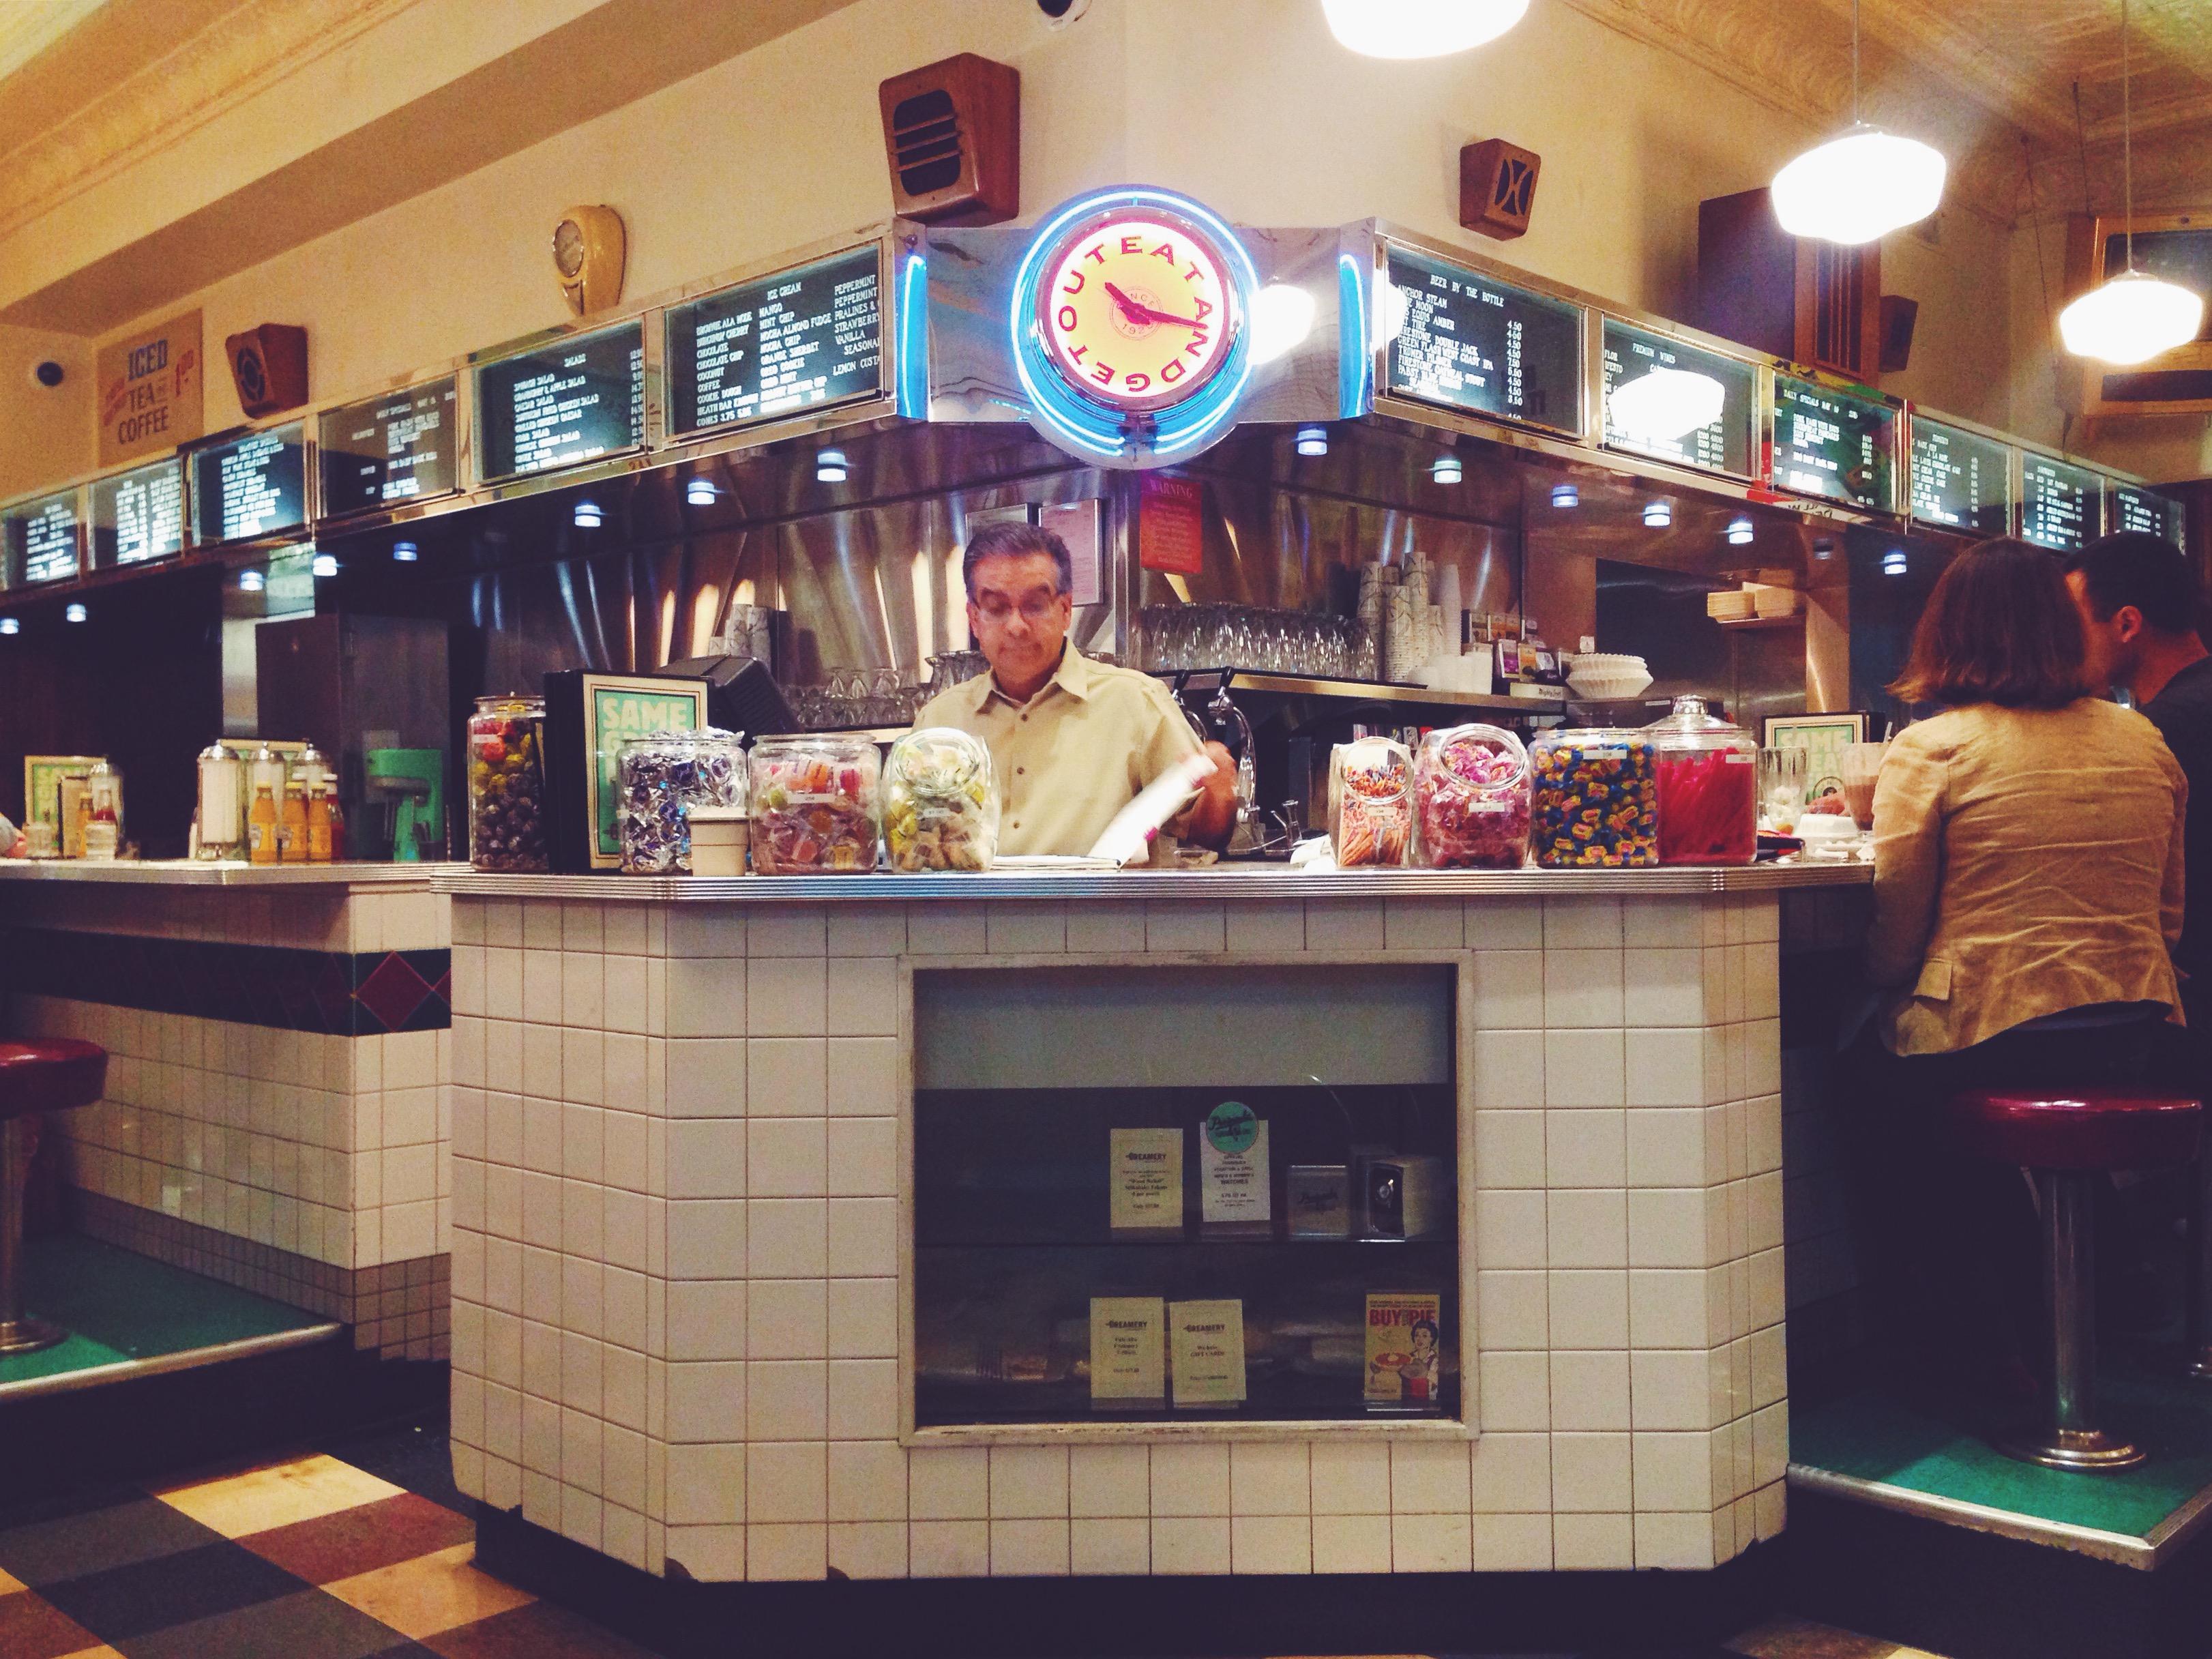 Diner-Creamery-Palo-Alto2.jpeg